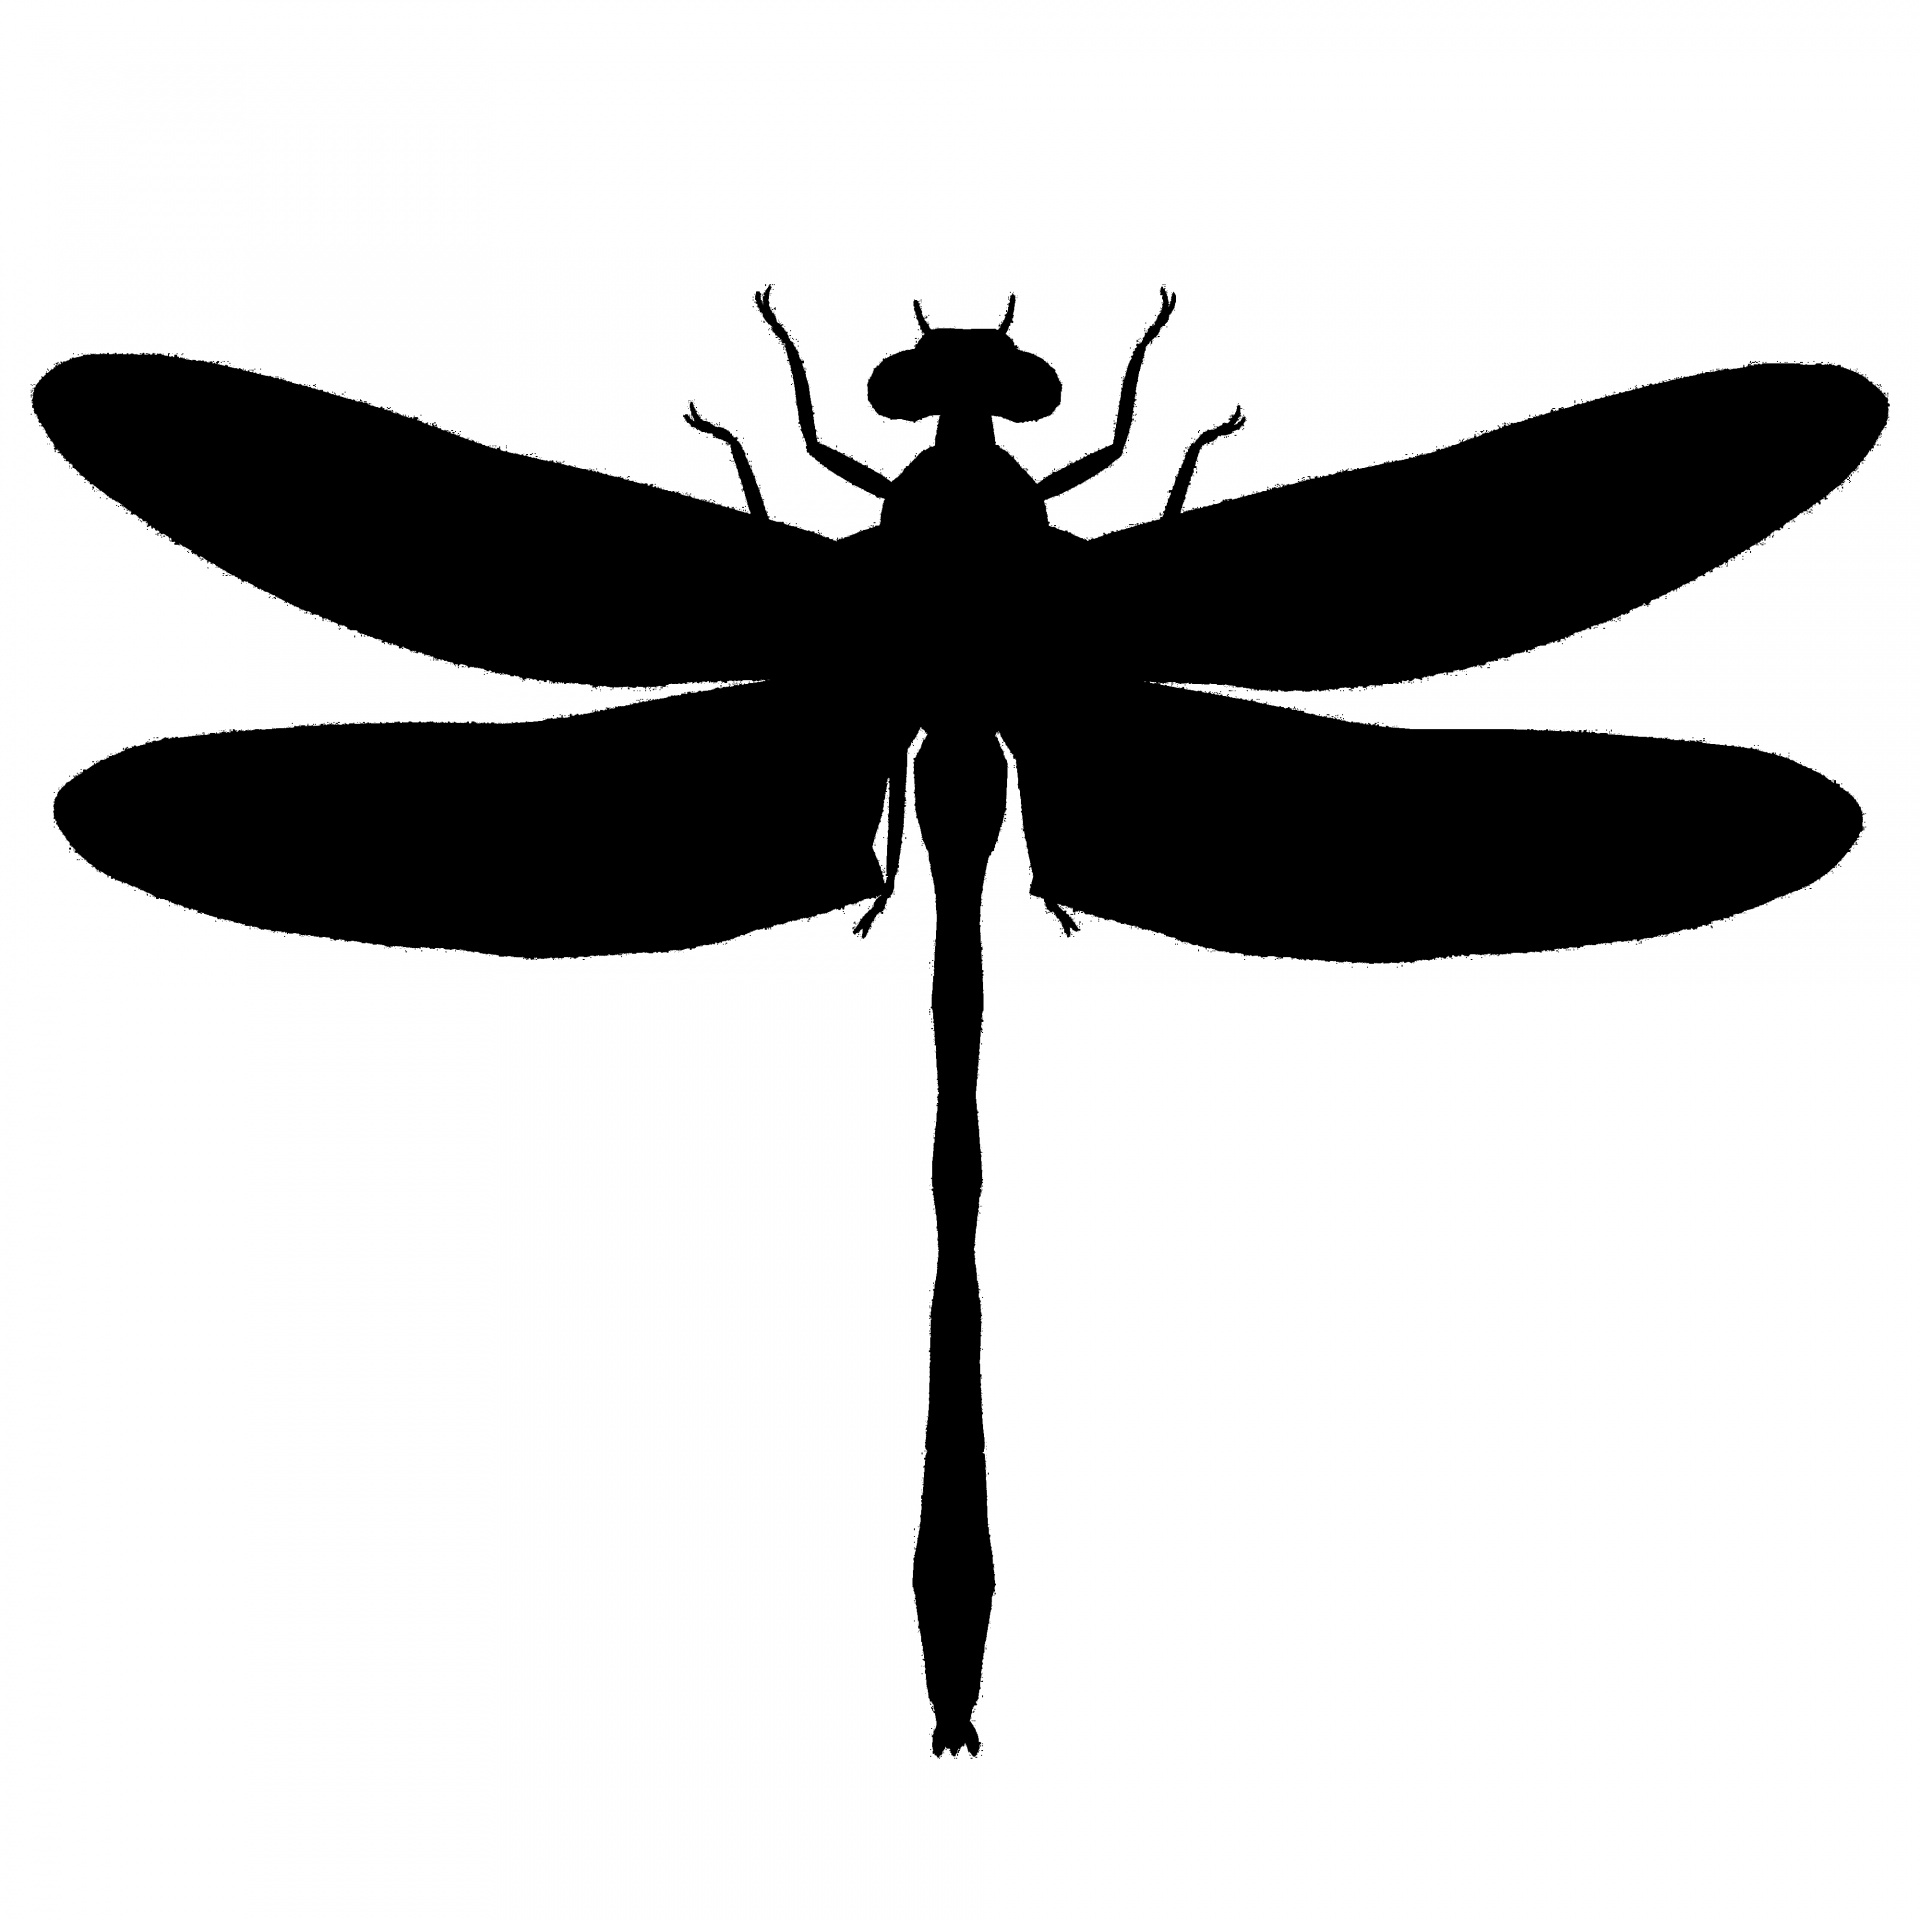 1920x1920 Dragonfly Ii Free Stock Photo